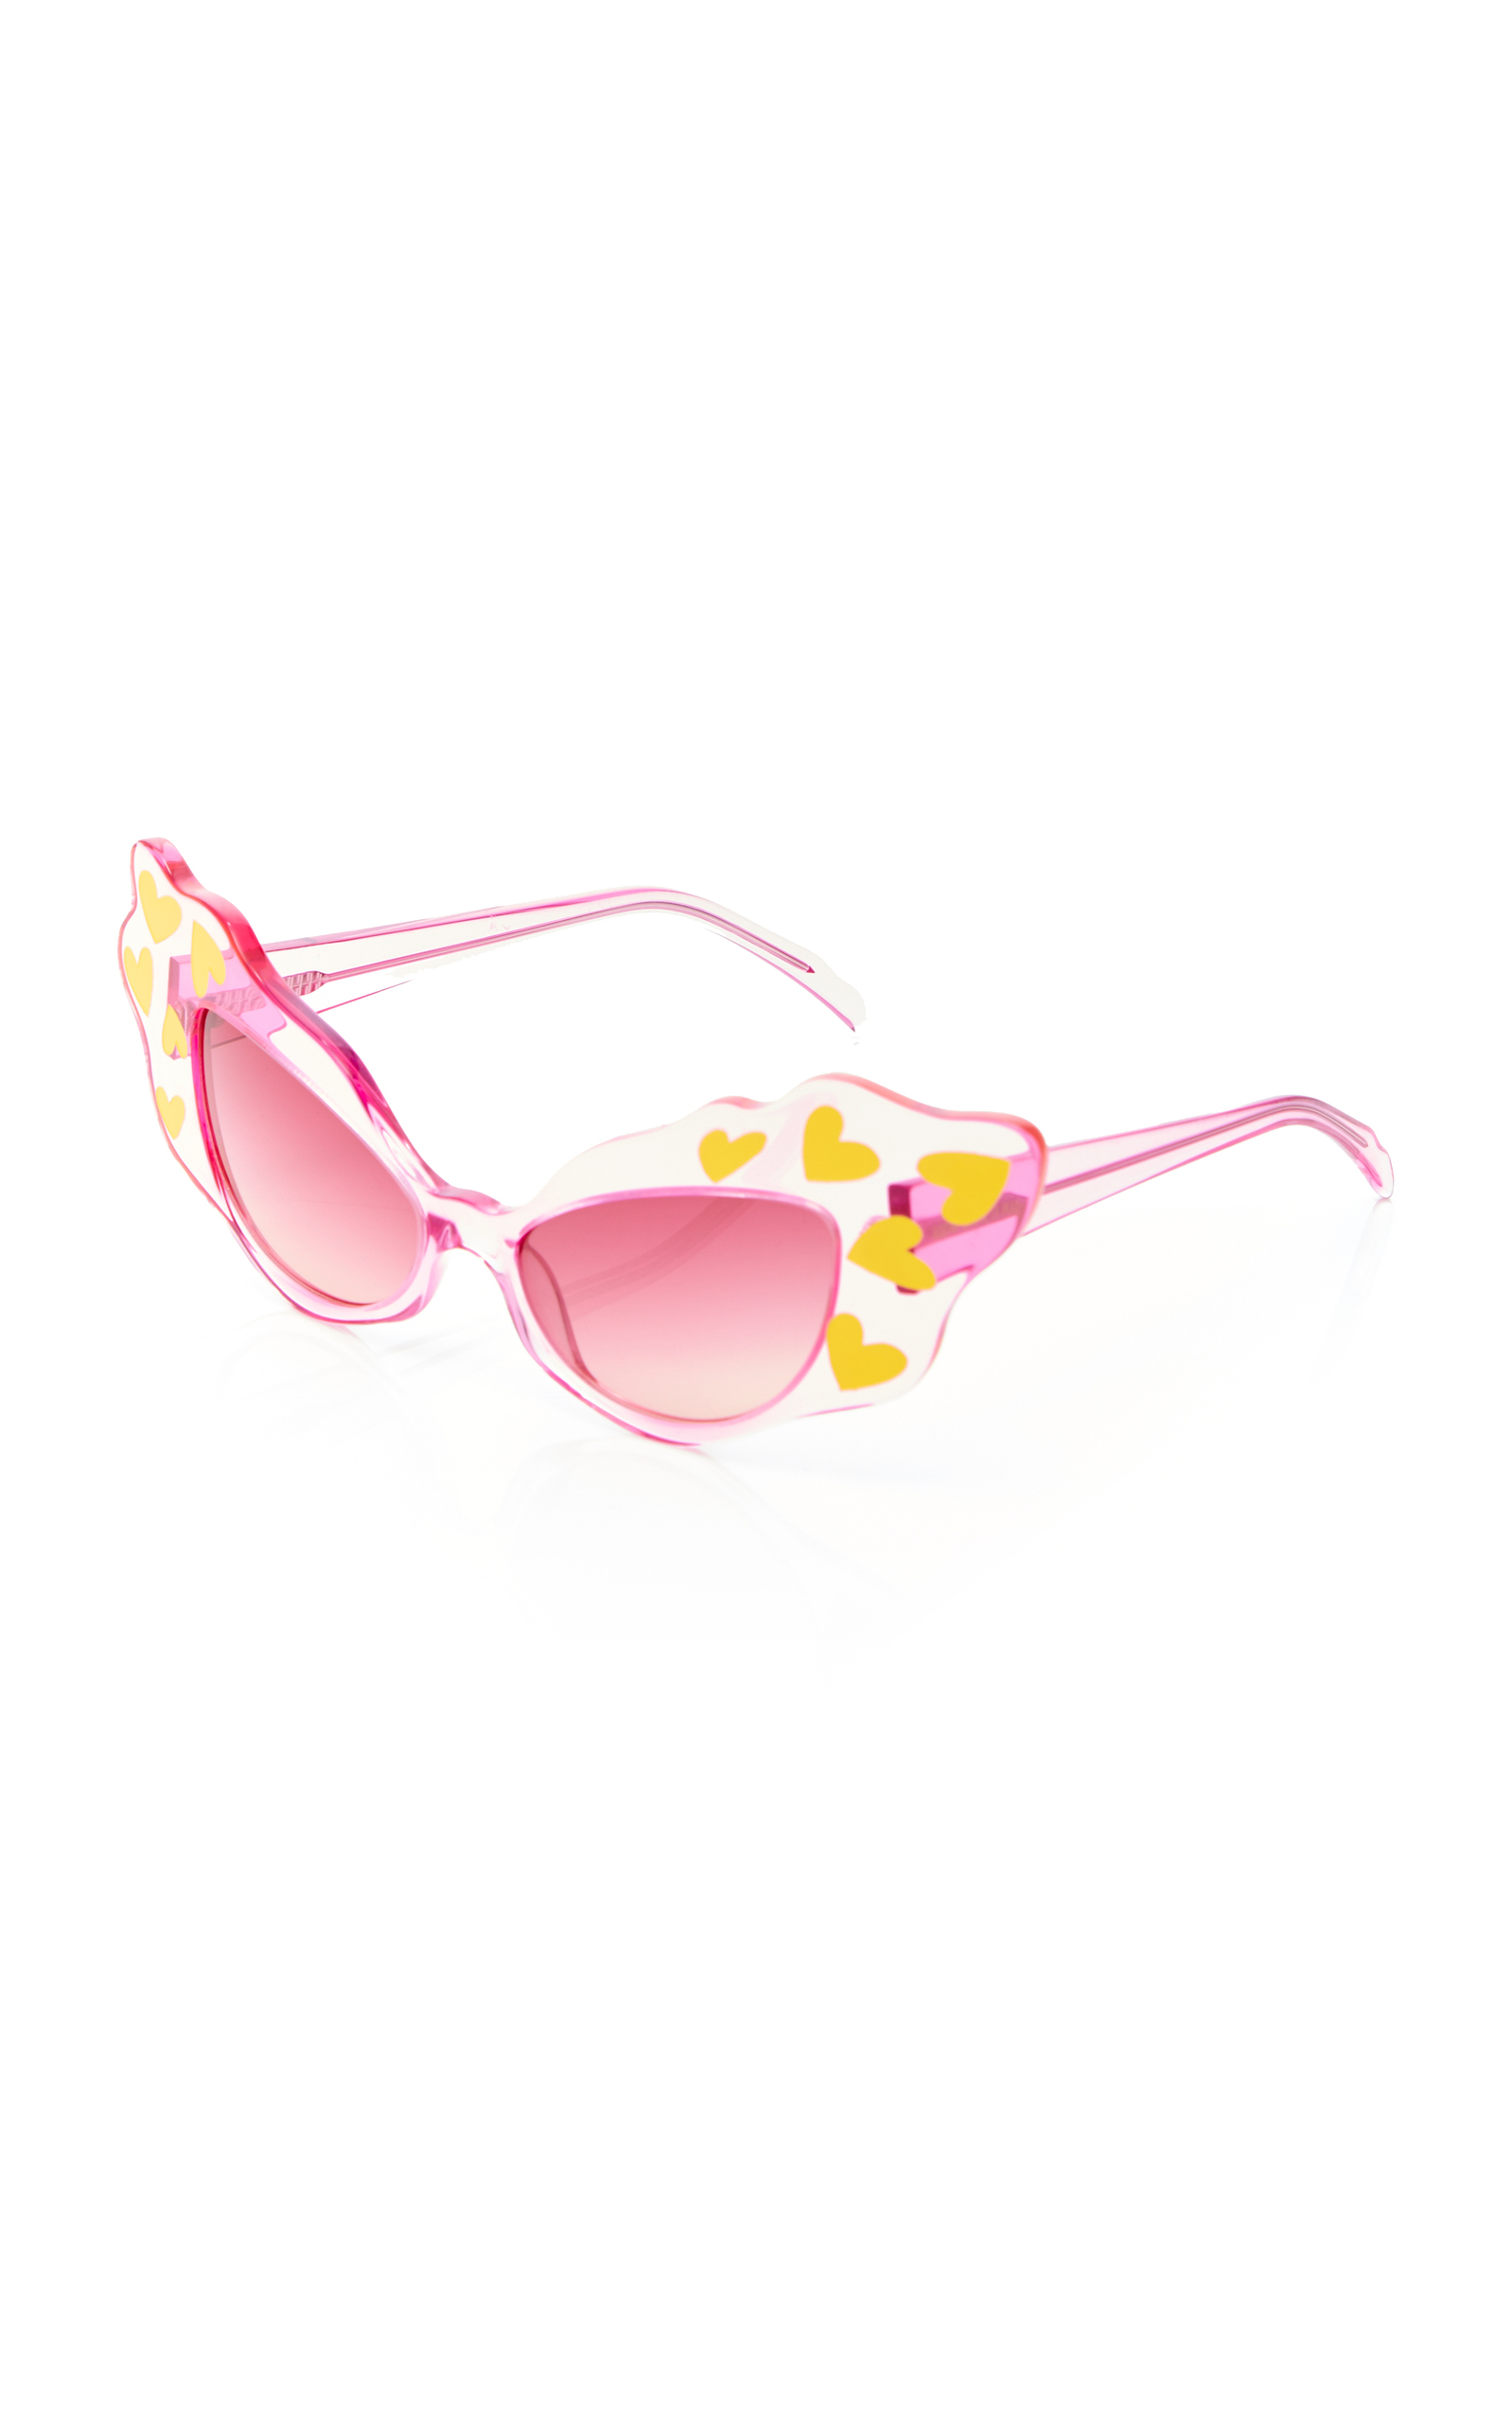 dcc661a0b4 Agatha Ruiz de la PradaCat-eye Sunglasses. CLOSE. Loading. Loading